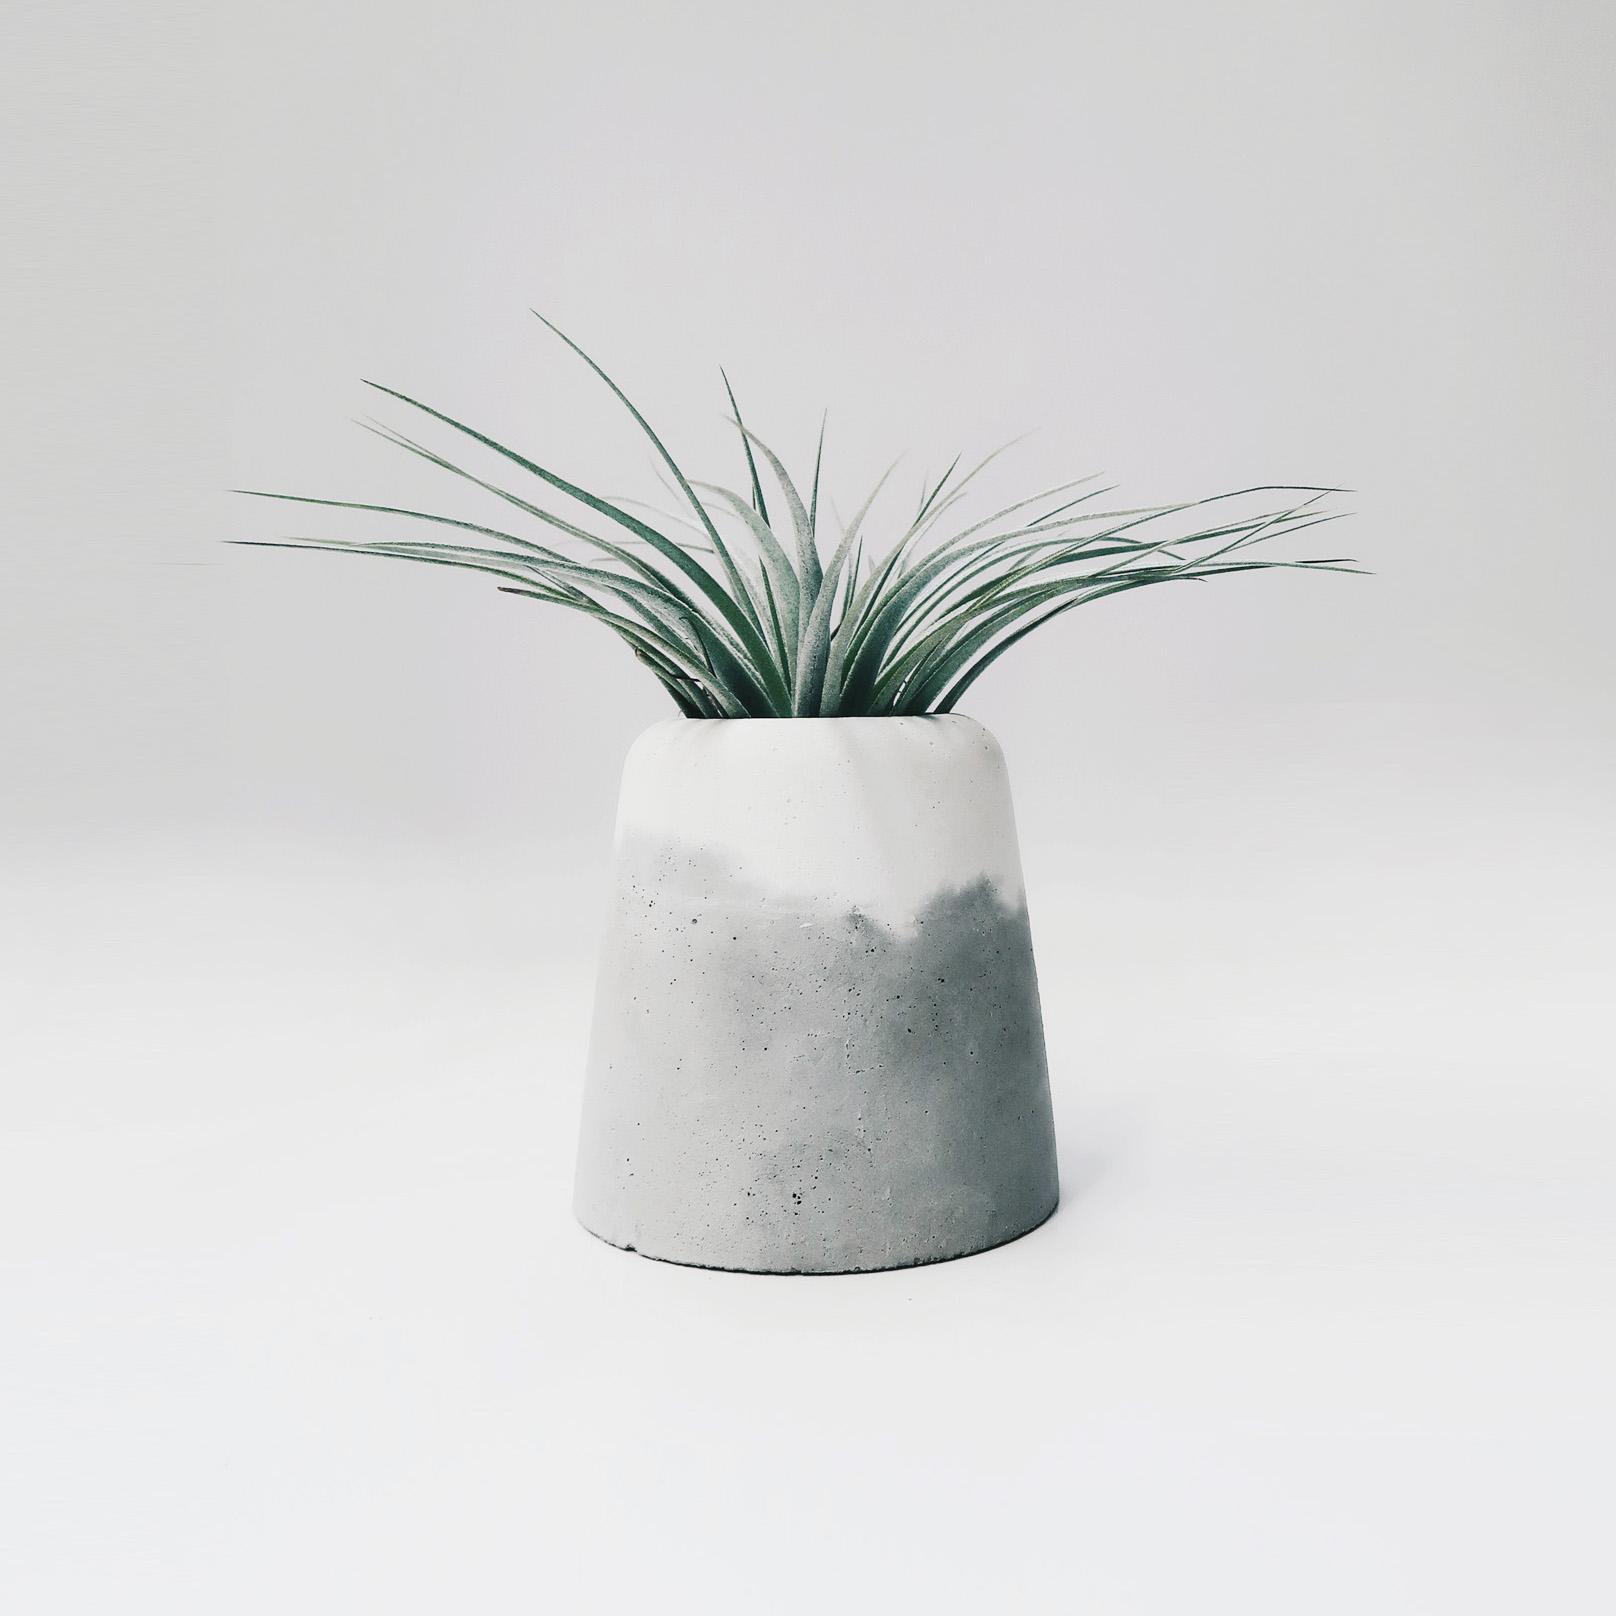 SNOW VOLCAN 大雪火山雙色水泥盆器 / Grey & White Concrete pot